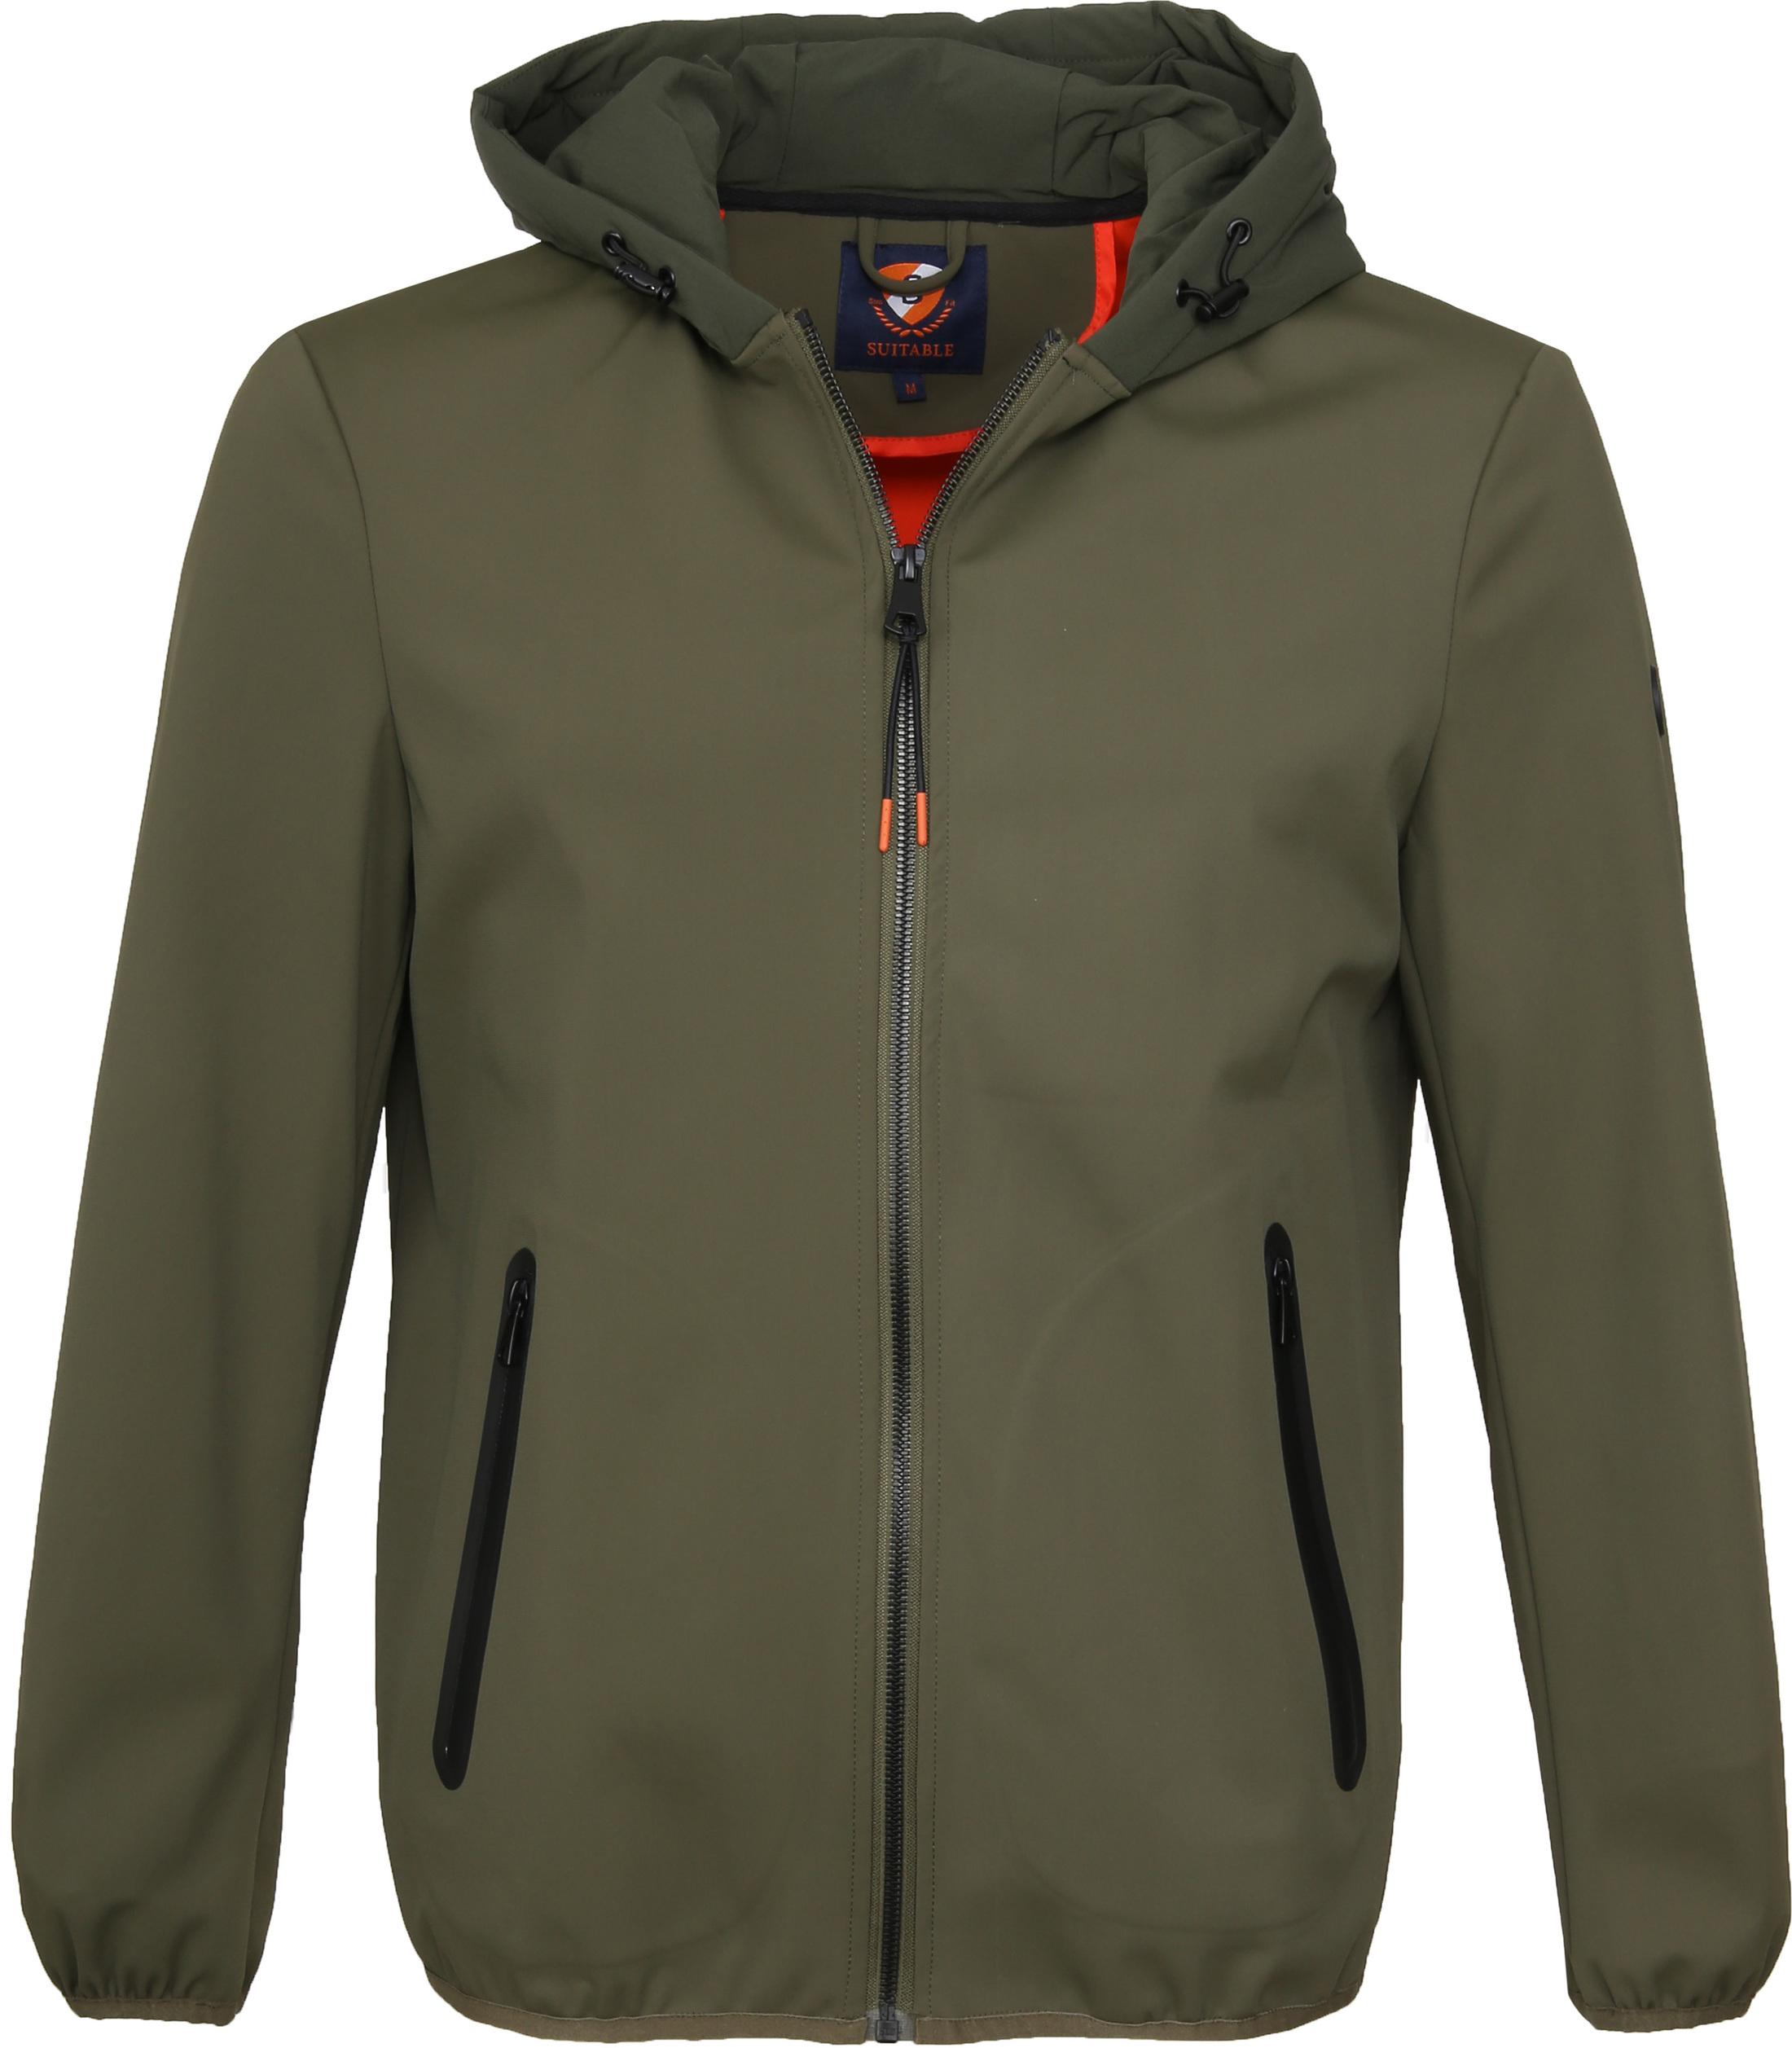 Suitable Softshell Jacket Tom Army foto 0